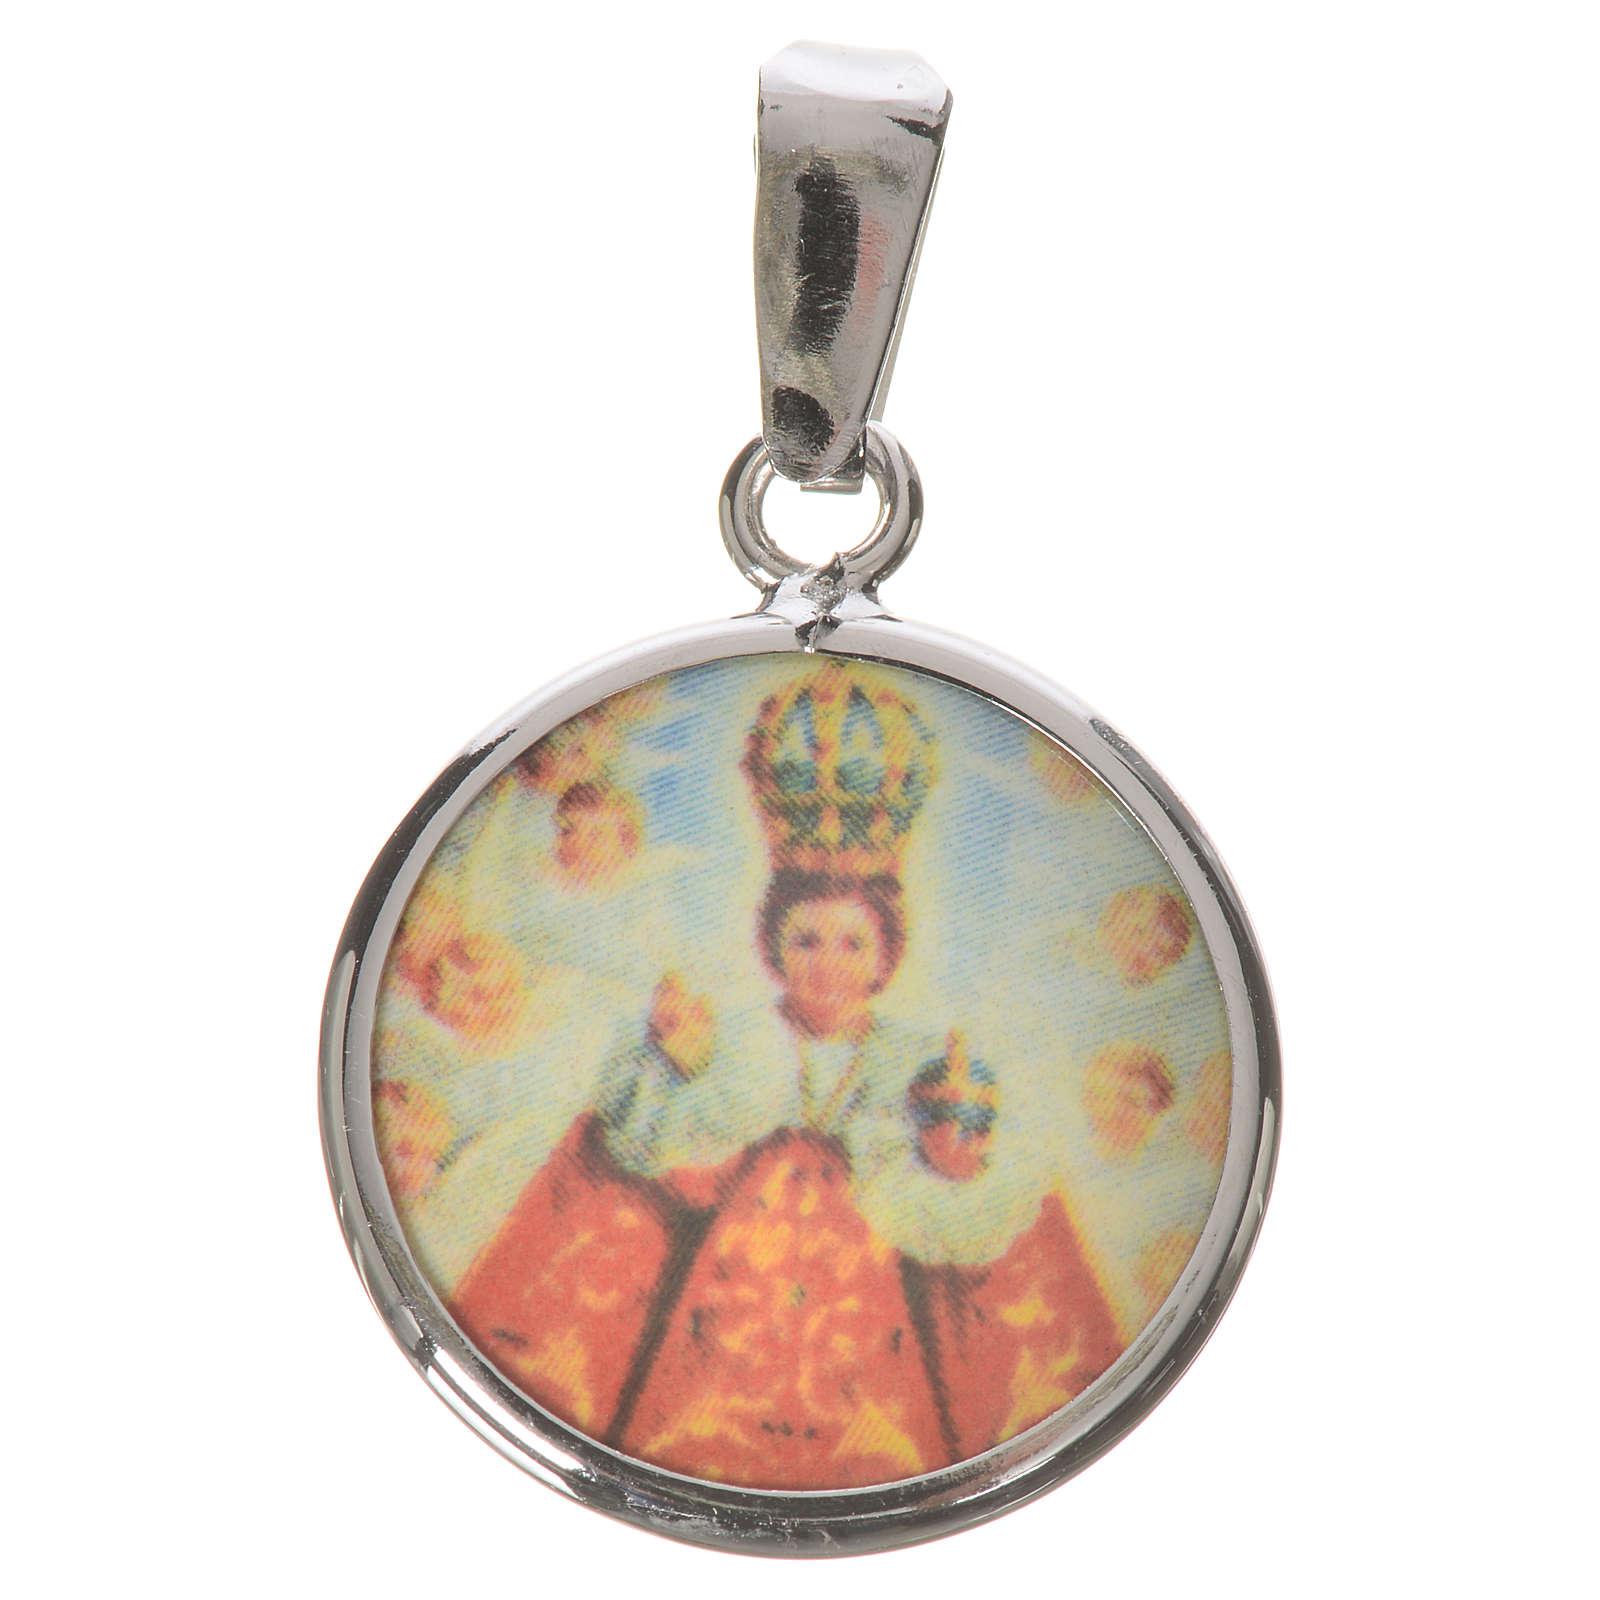 Medaglia tonda arg. 18 mm Gesù bambino di Praga 4